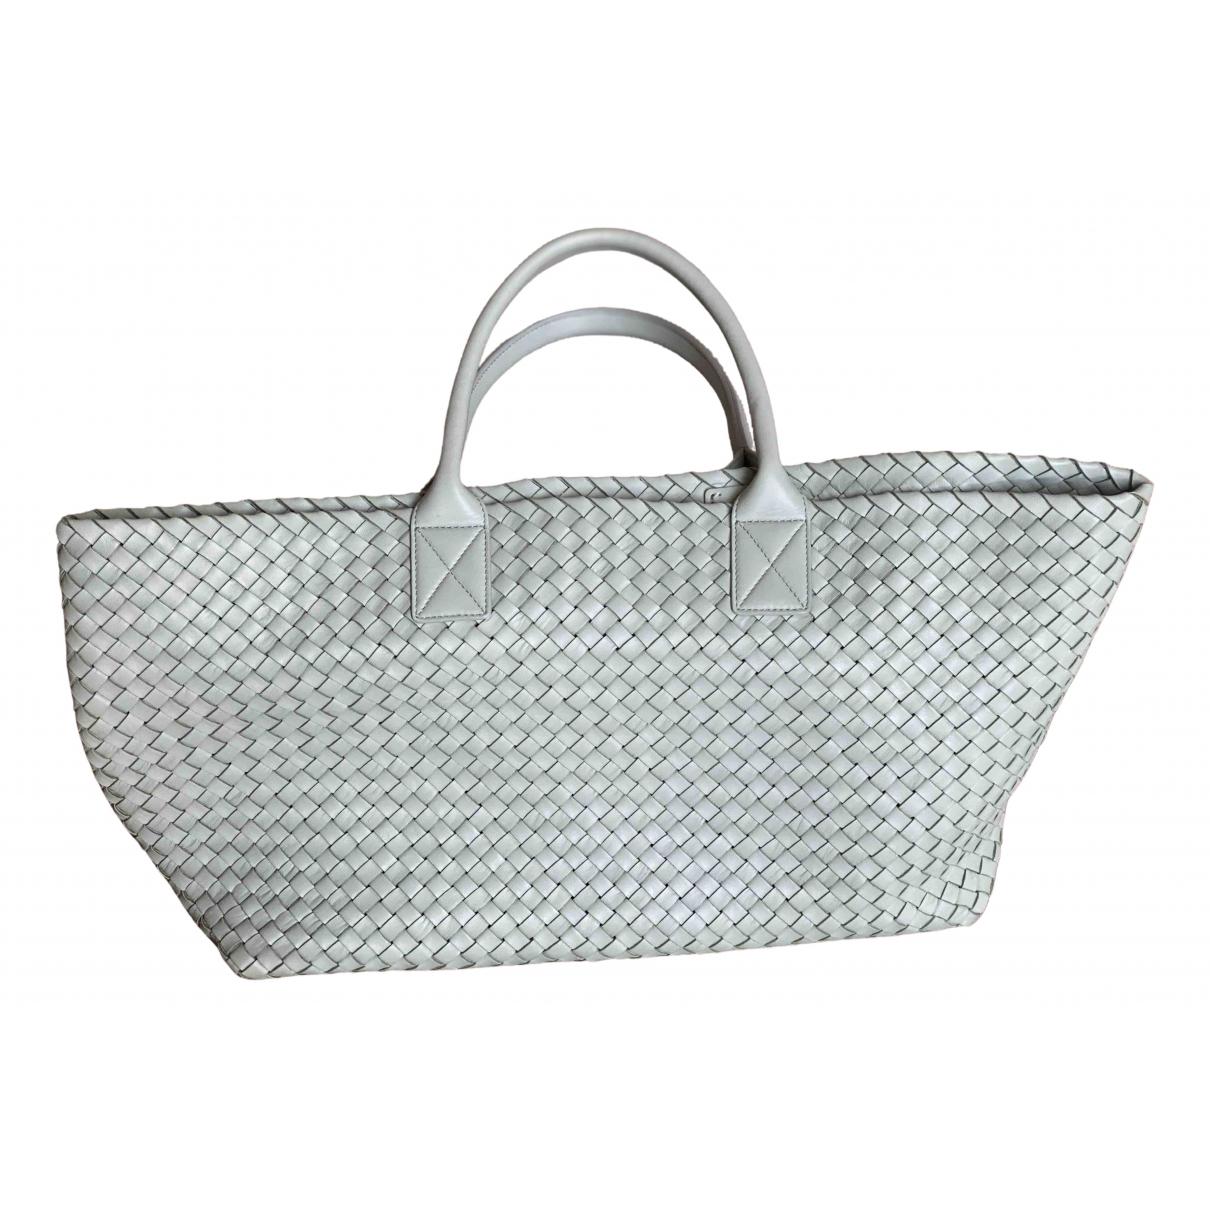 Bottega Veneta Cabat Green Leather handbag for Women N